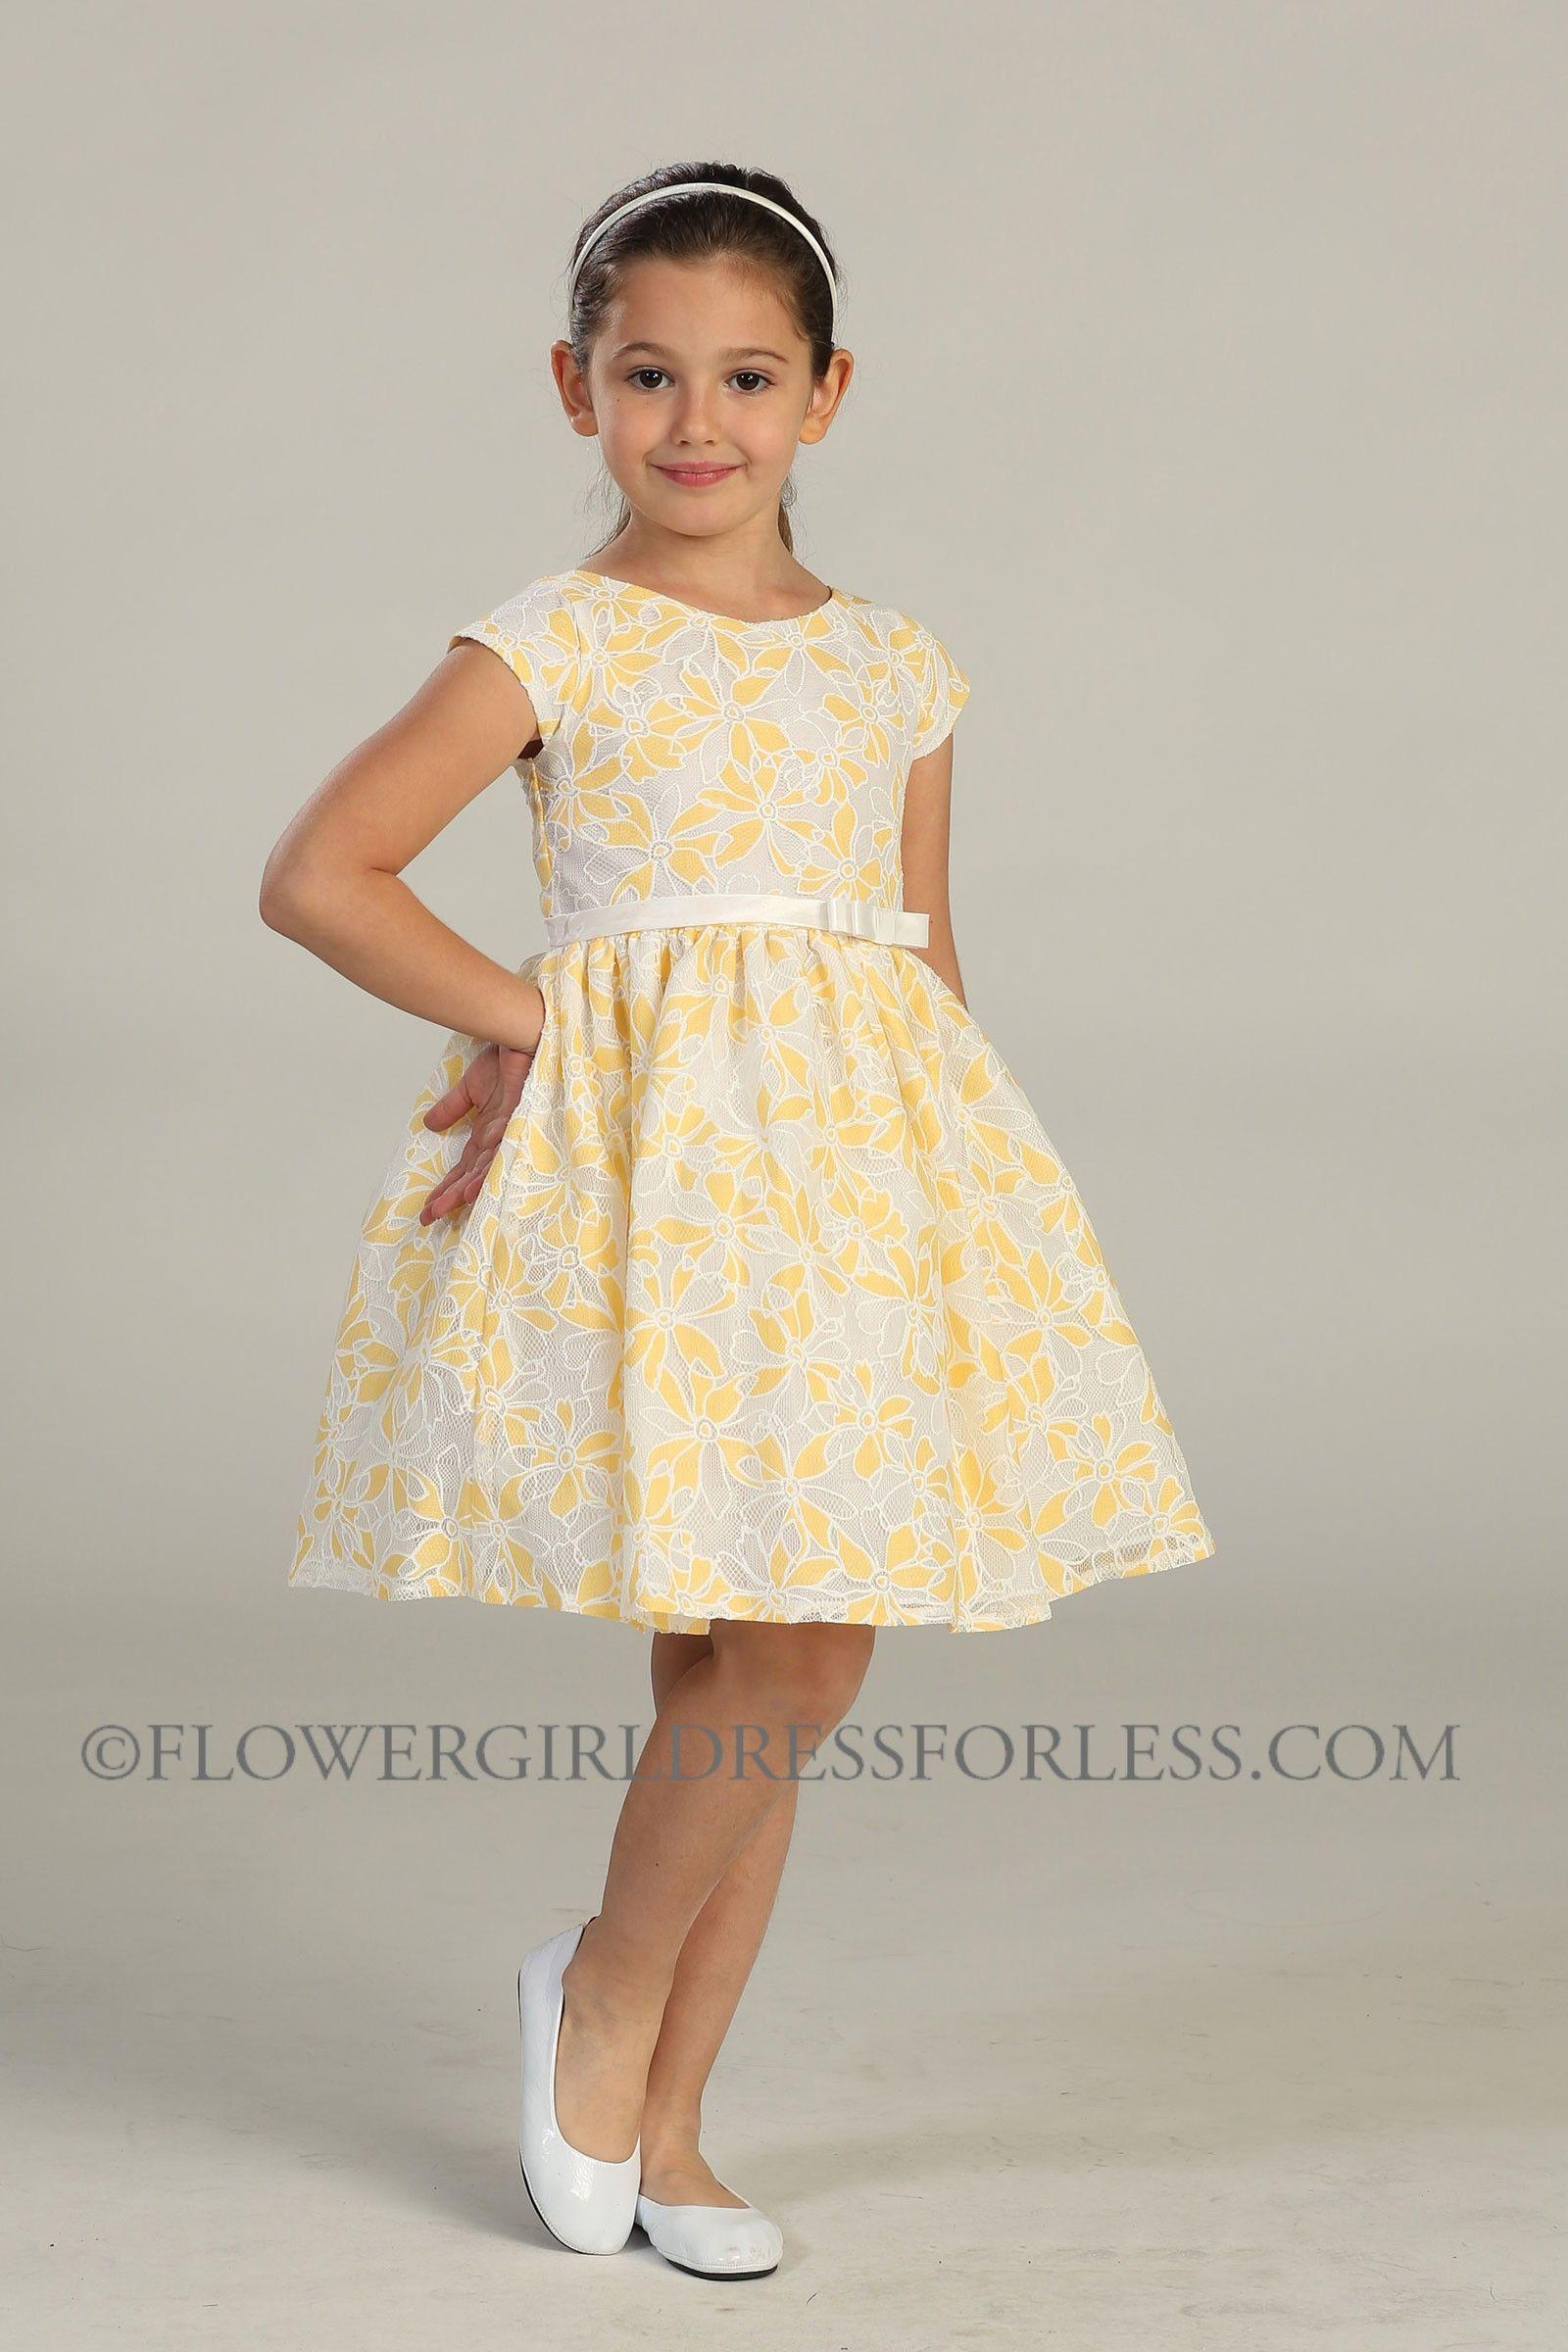 Girls Dress Style 438 Cap Sleeve Flower Lace Dress 5699 Flower